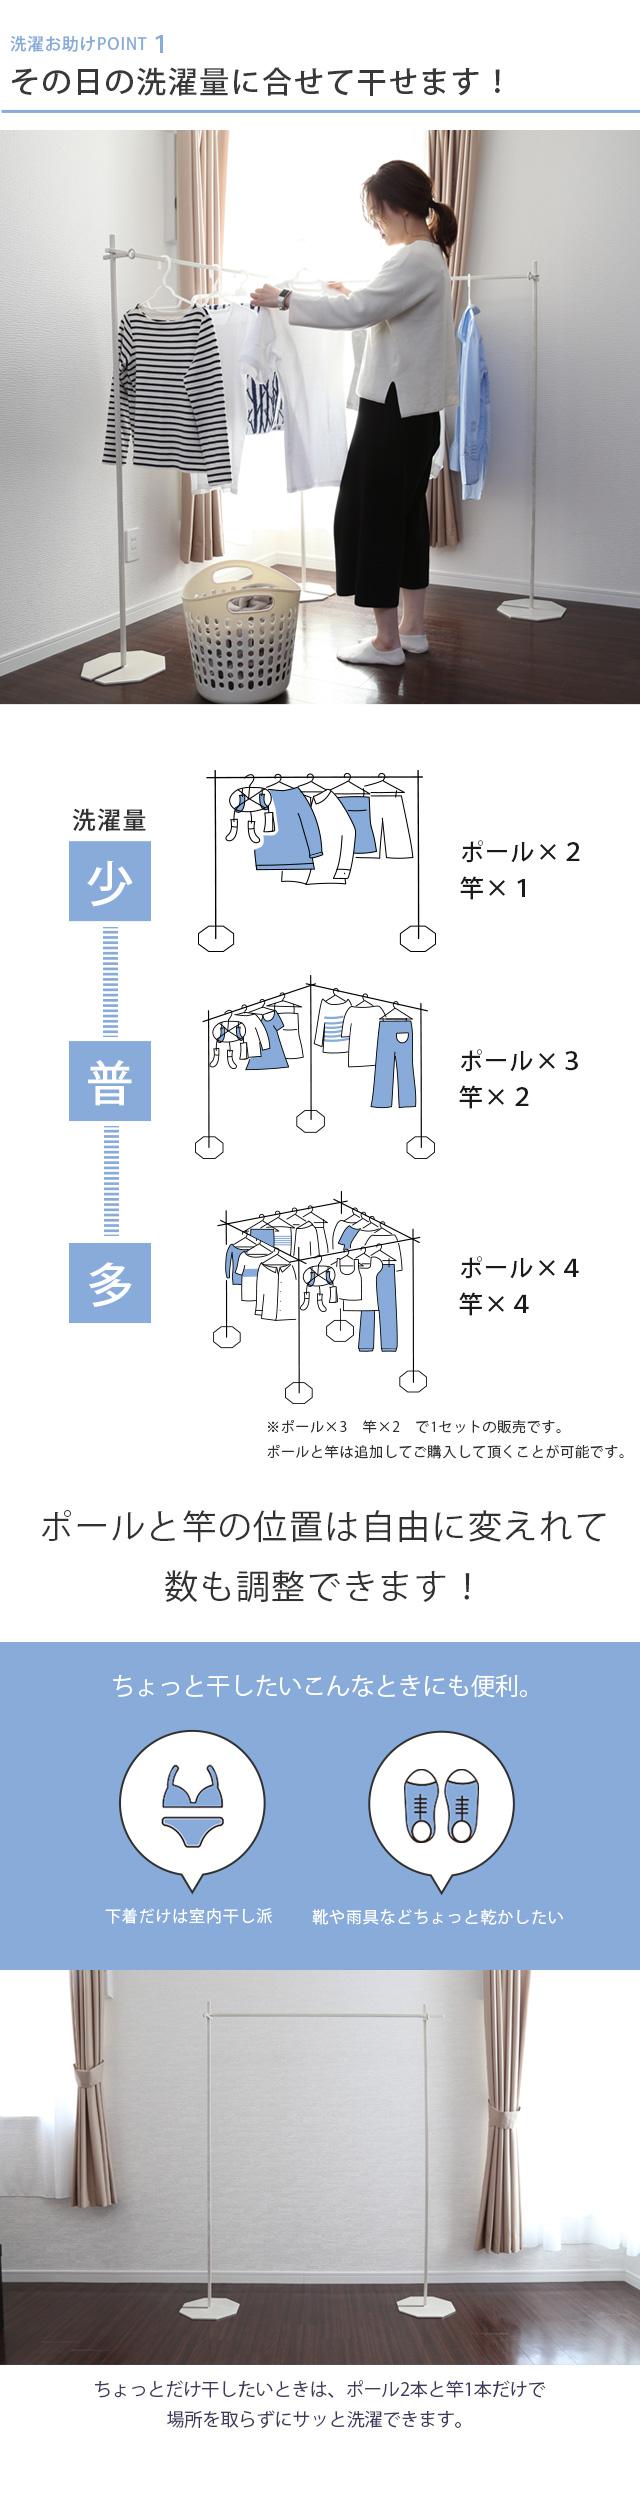 『Accent+ フリーウェイ物干し収納ハンガーラック』 3